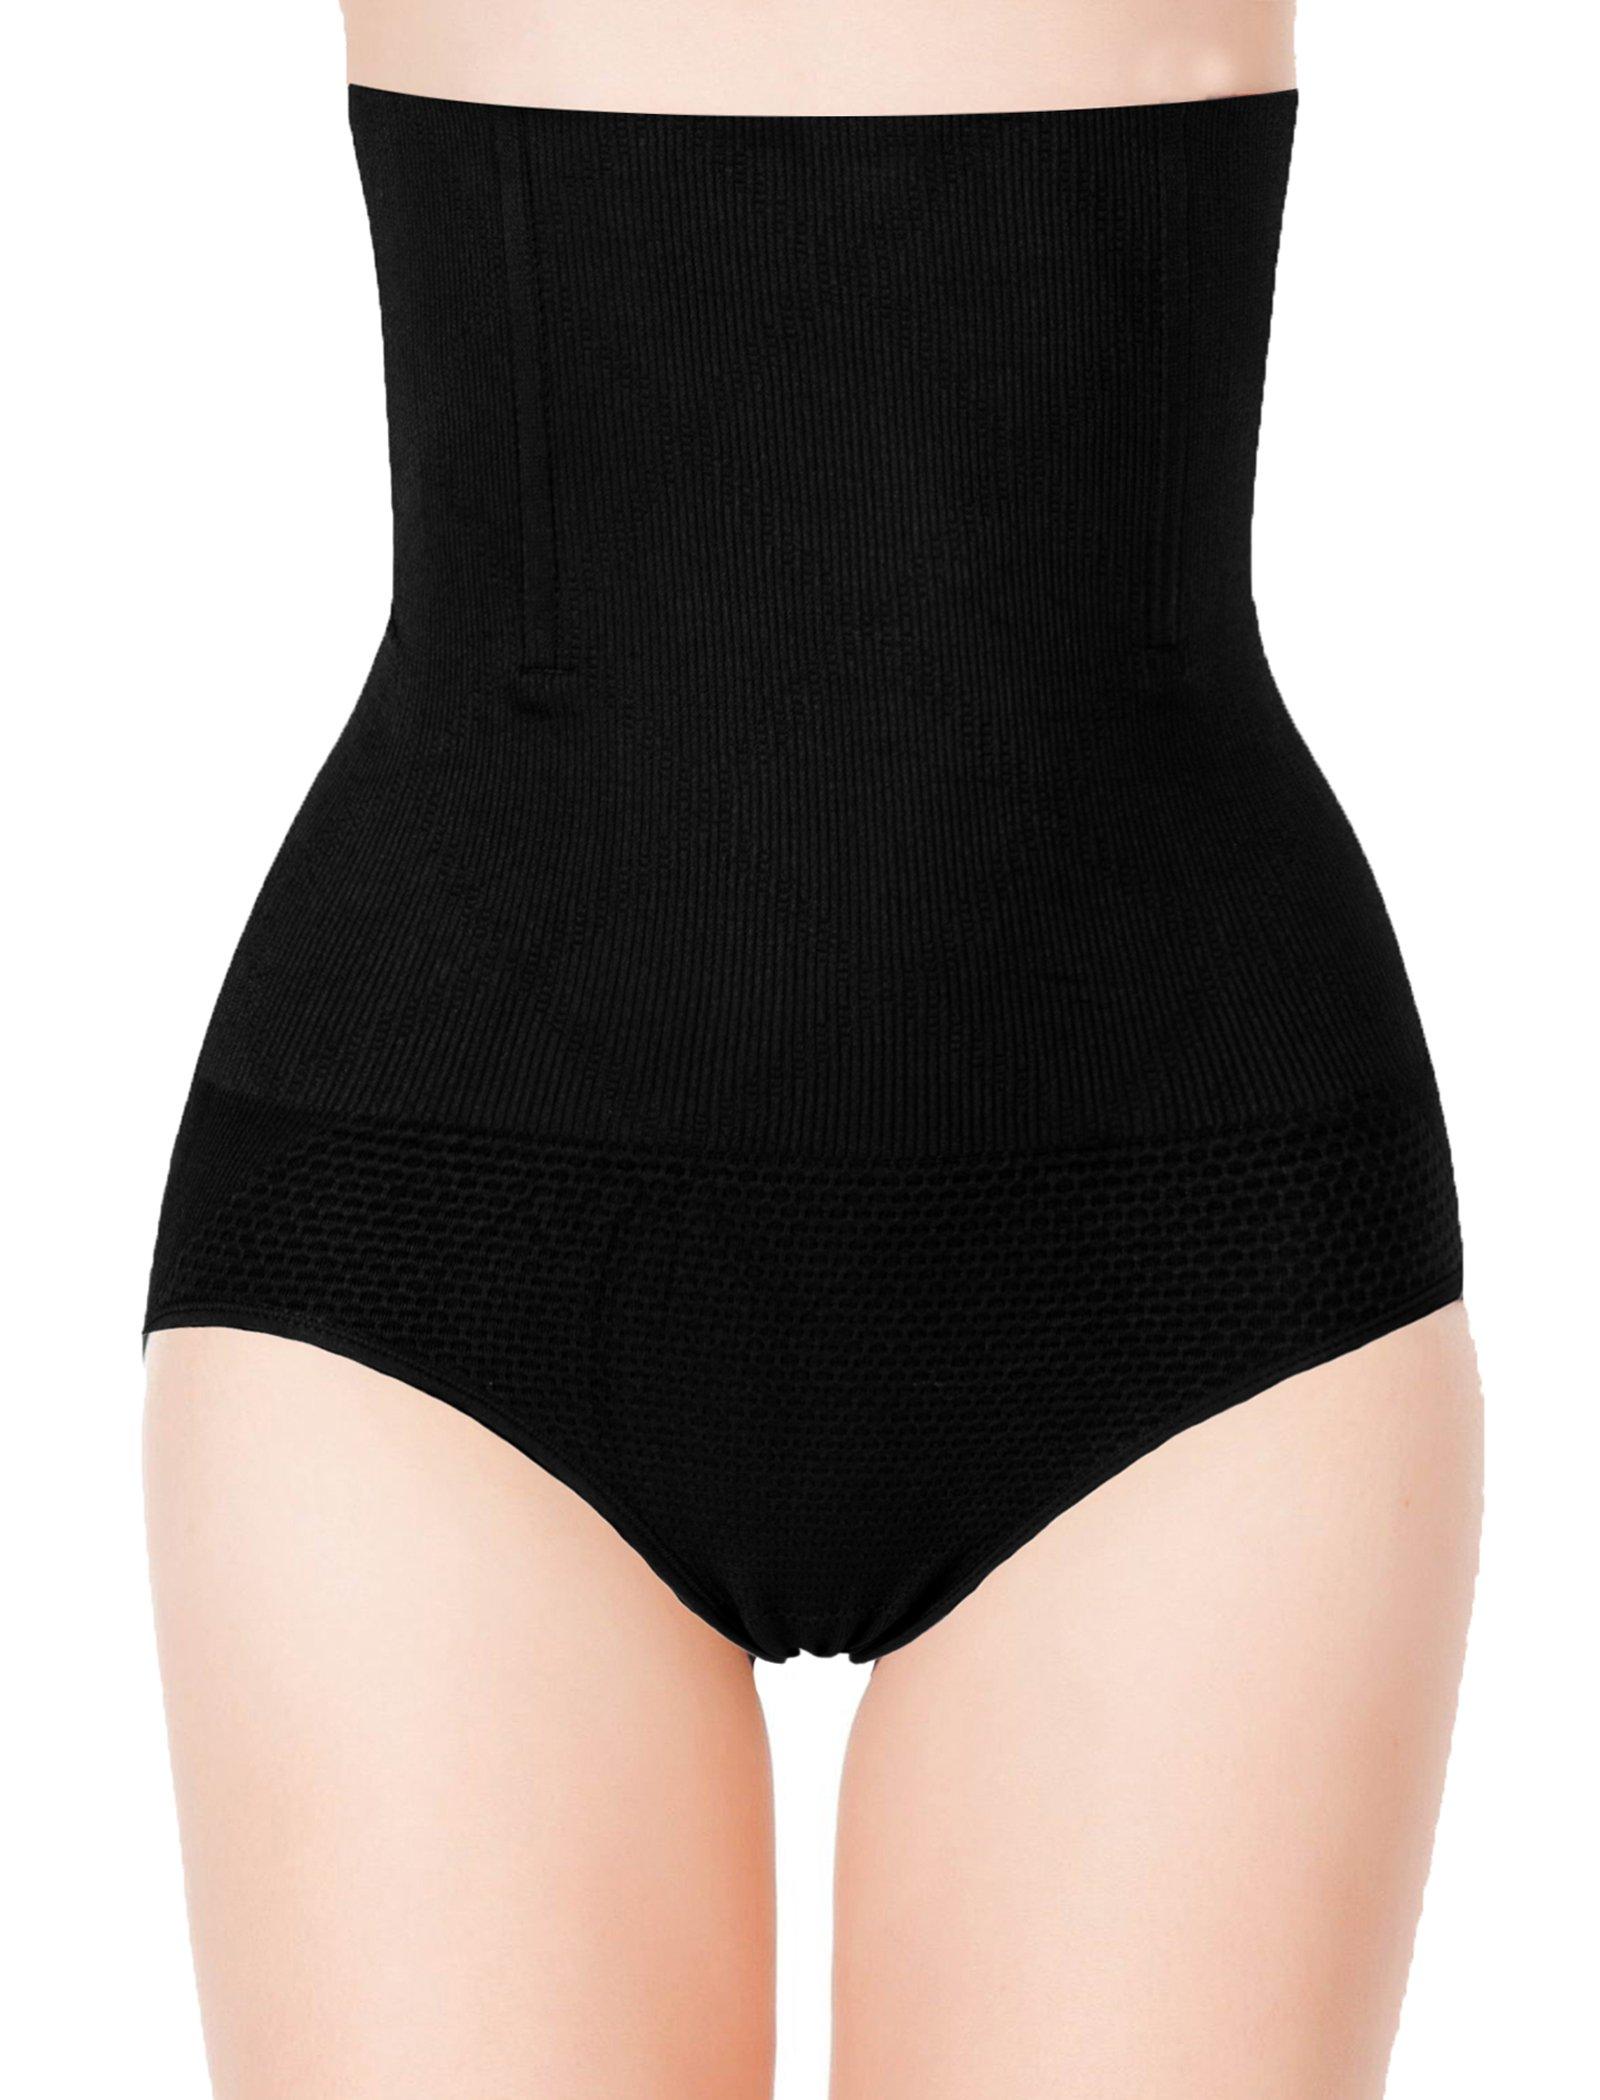 Womens High Waist Butt Lifter Shapewear Slimming Underwear Tummy Control Panties